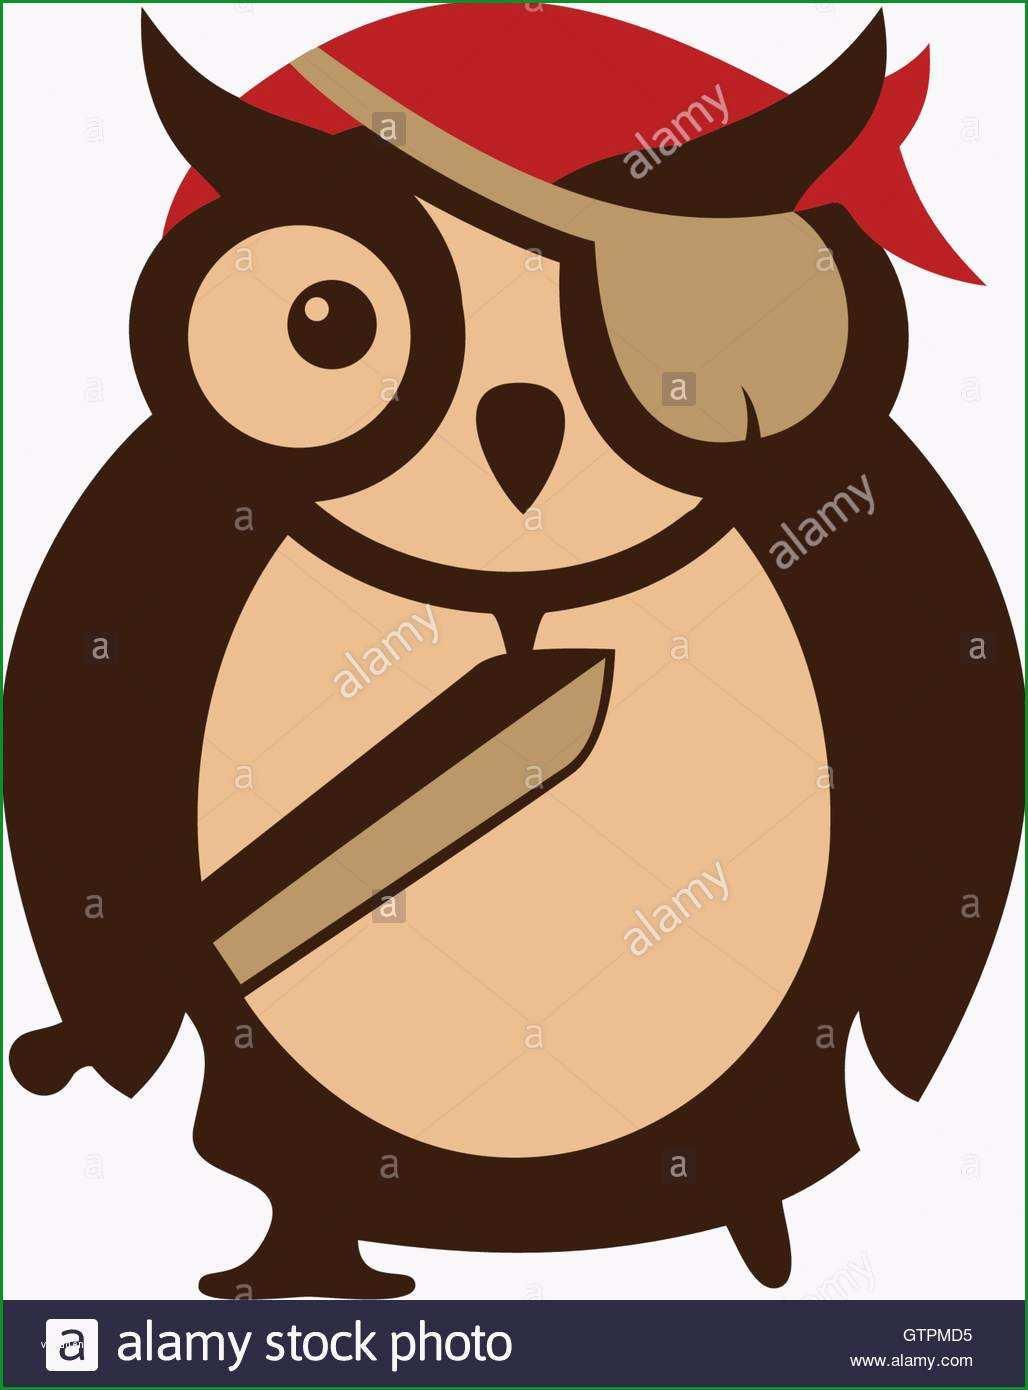 stockfoto cartoon logo symbol vorlage eule design piraten symbol logo vektor logo vorlage tier design eule vorlage abstrakte logos des